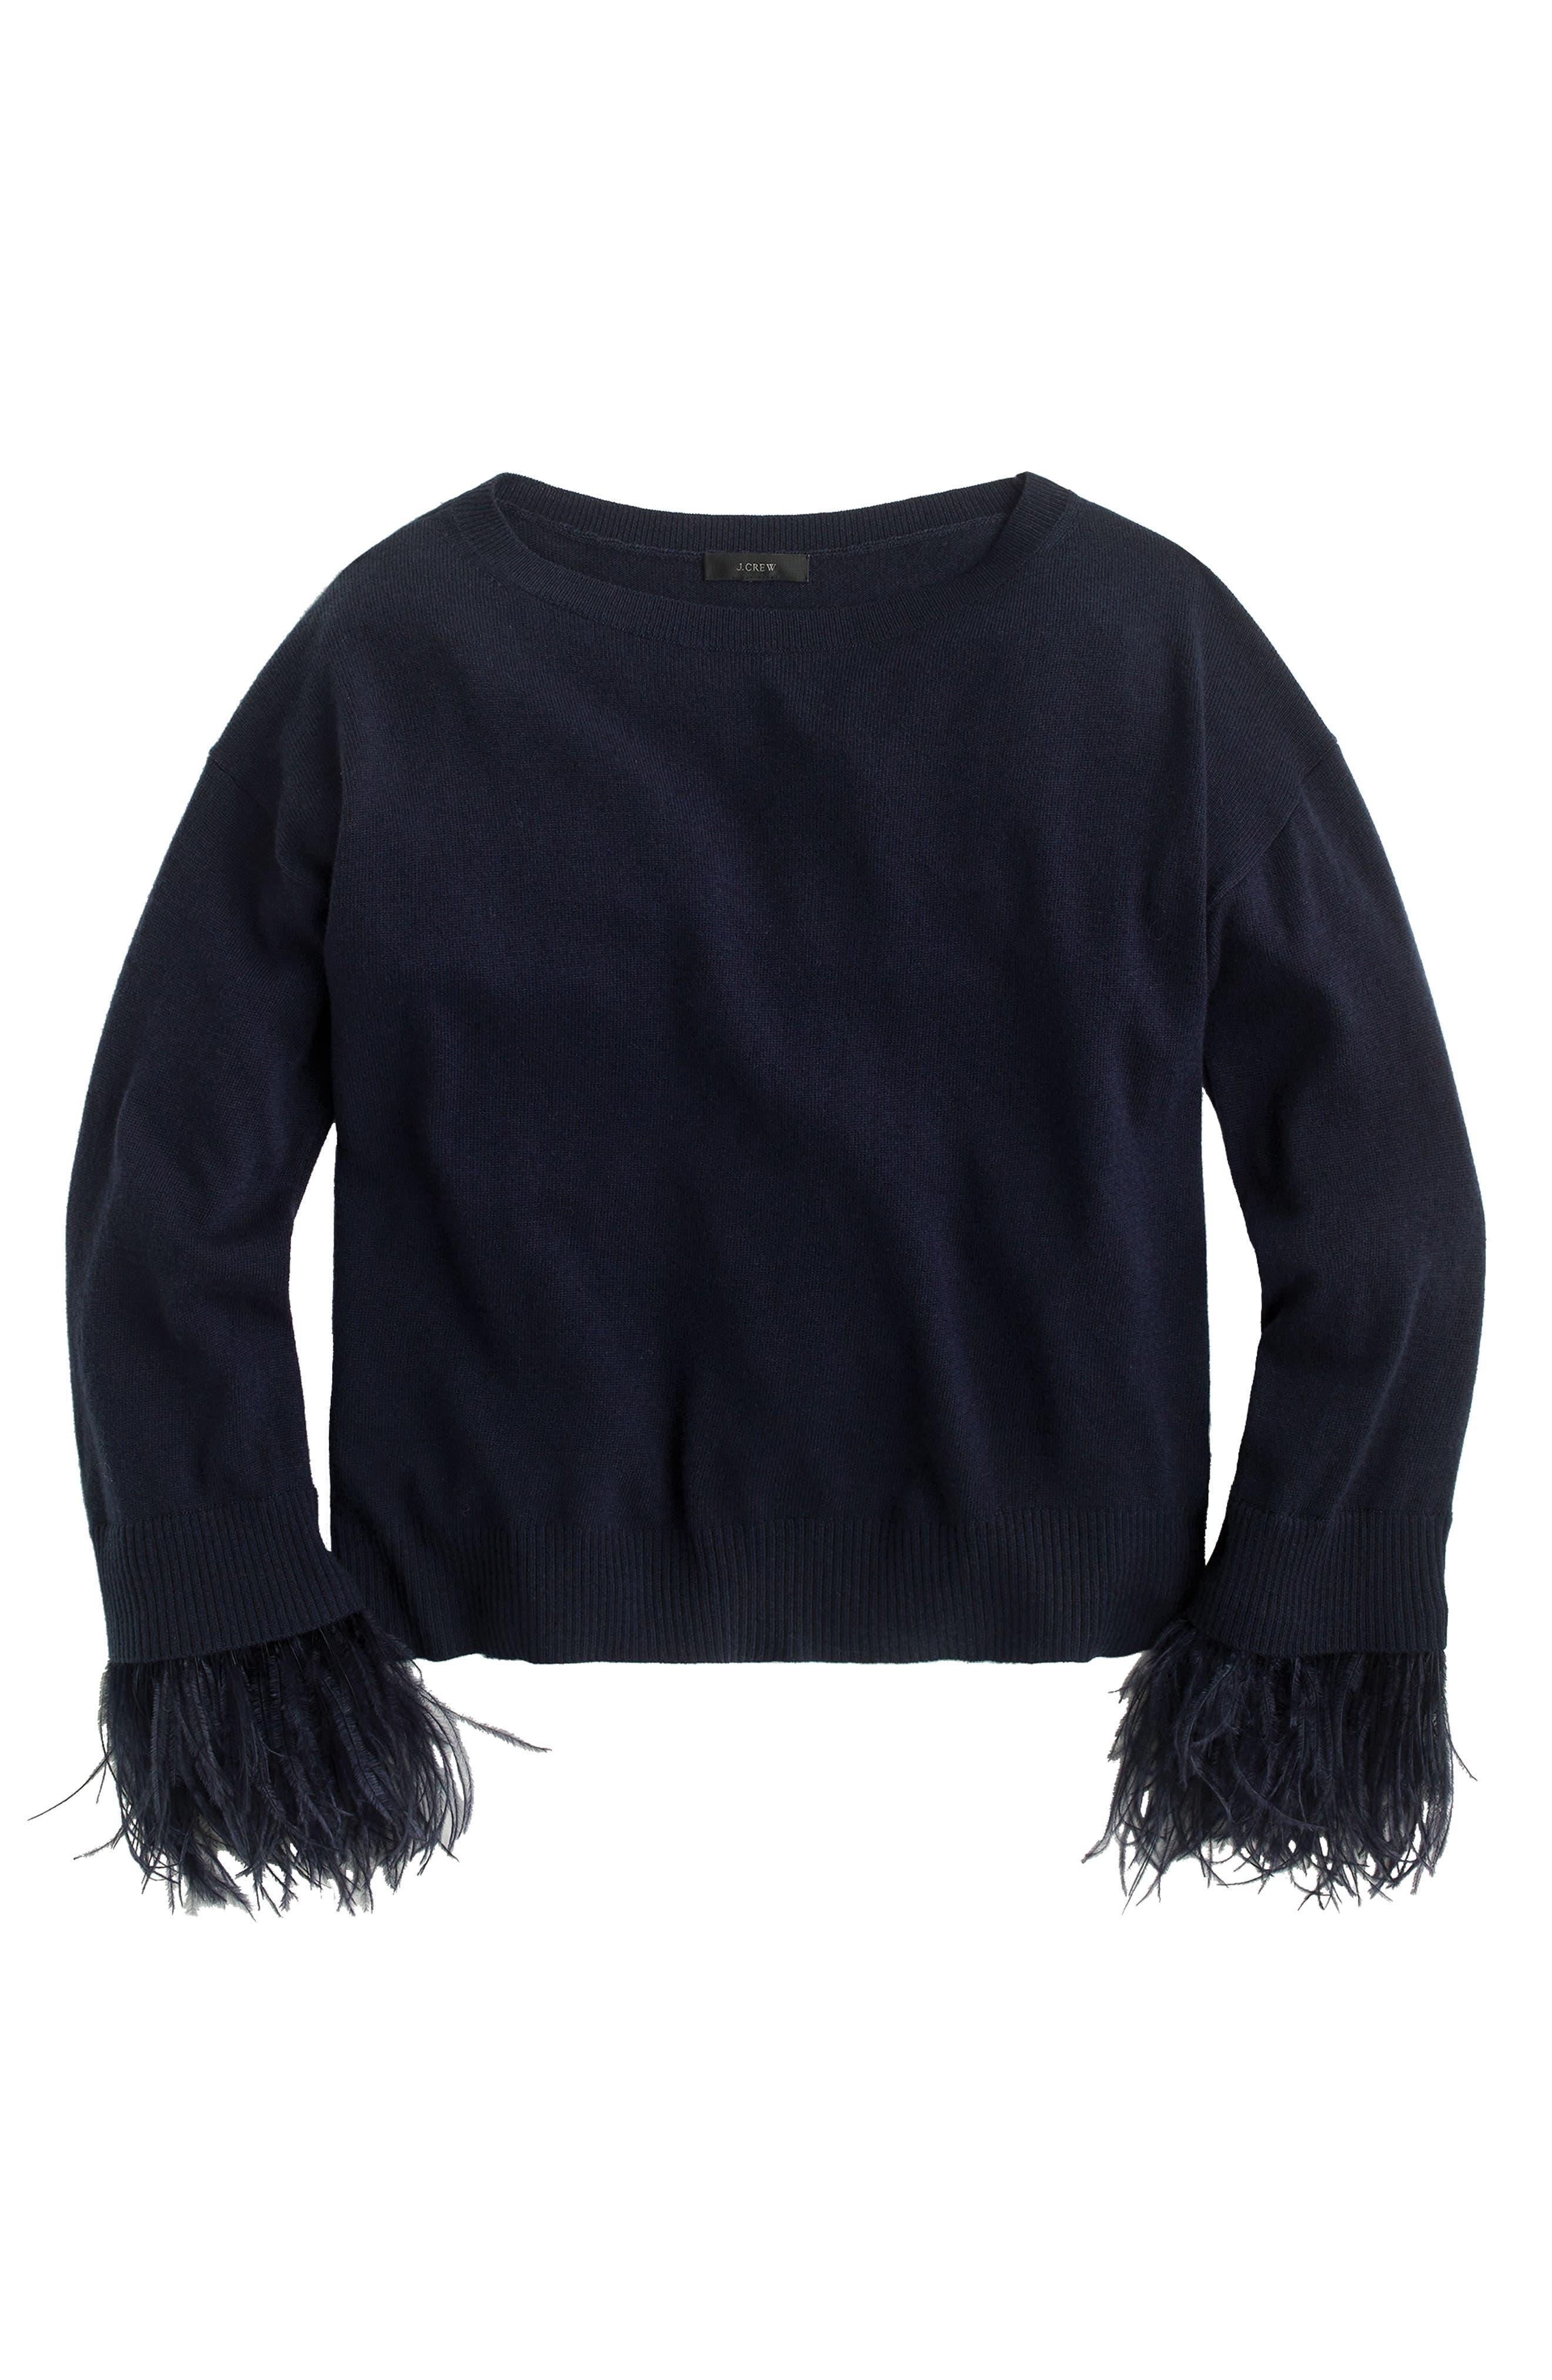 Main Image - J.Crew Feather Sleeve Crewneck Sweater